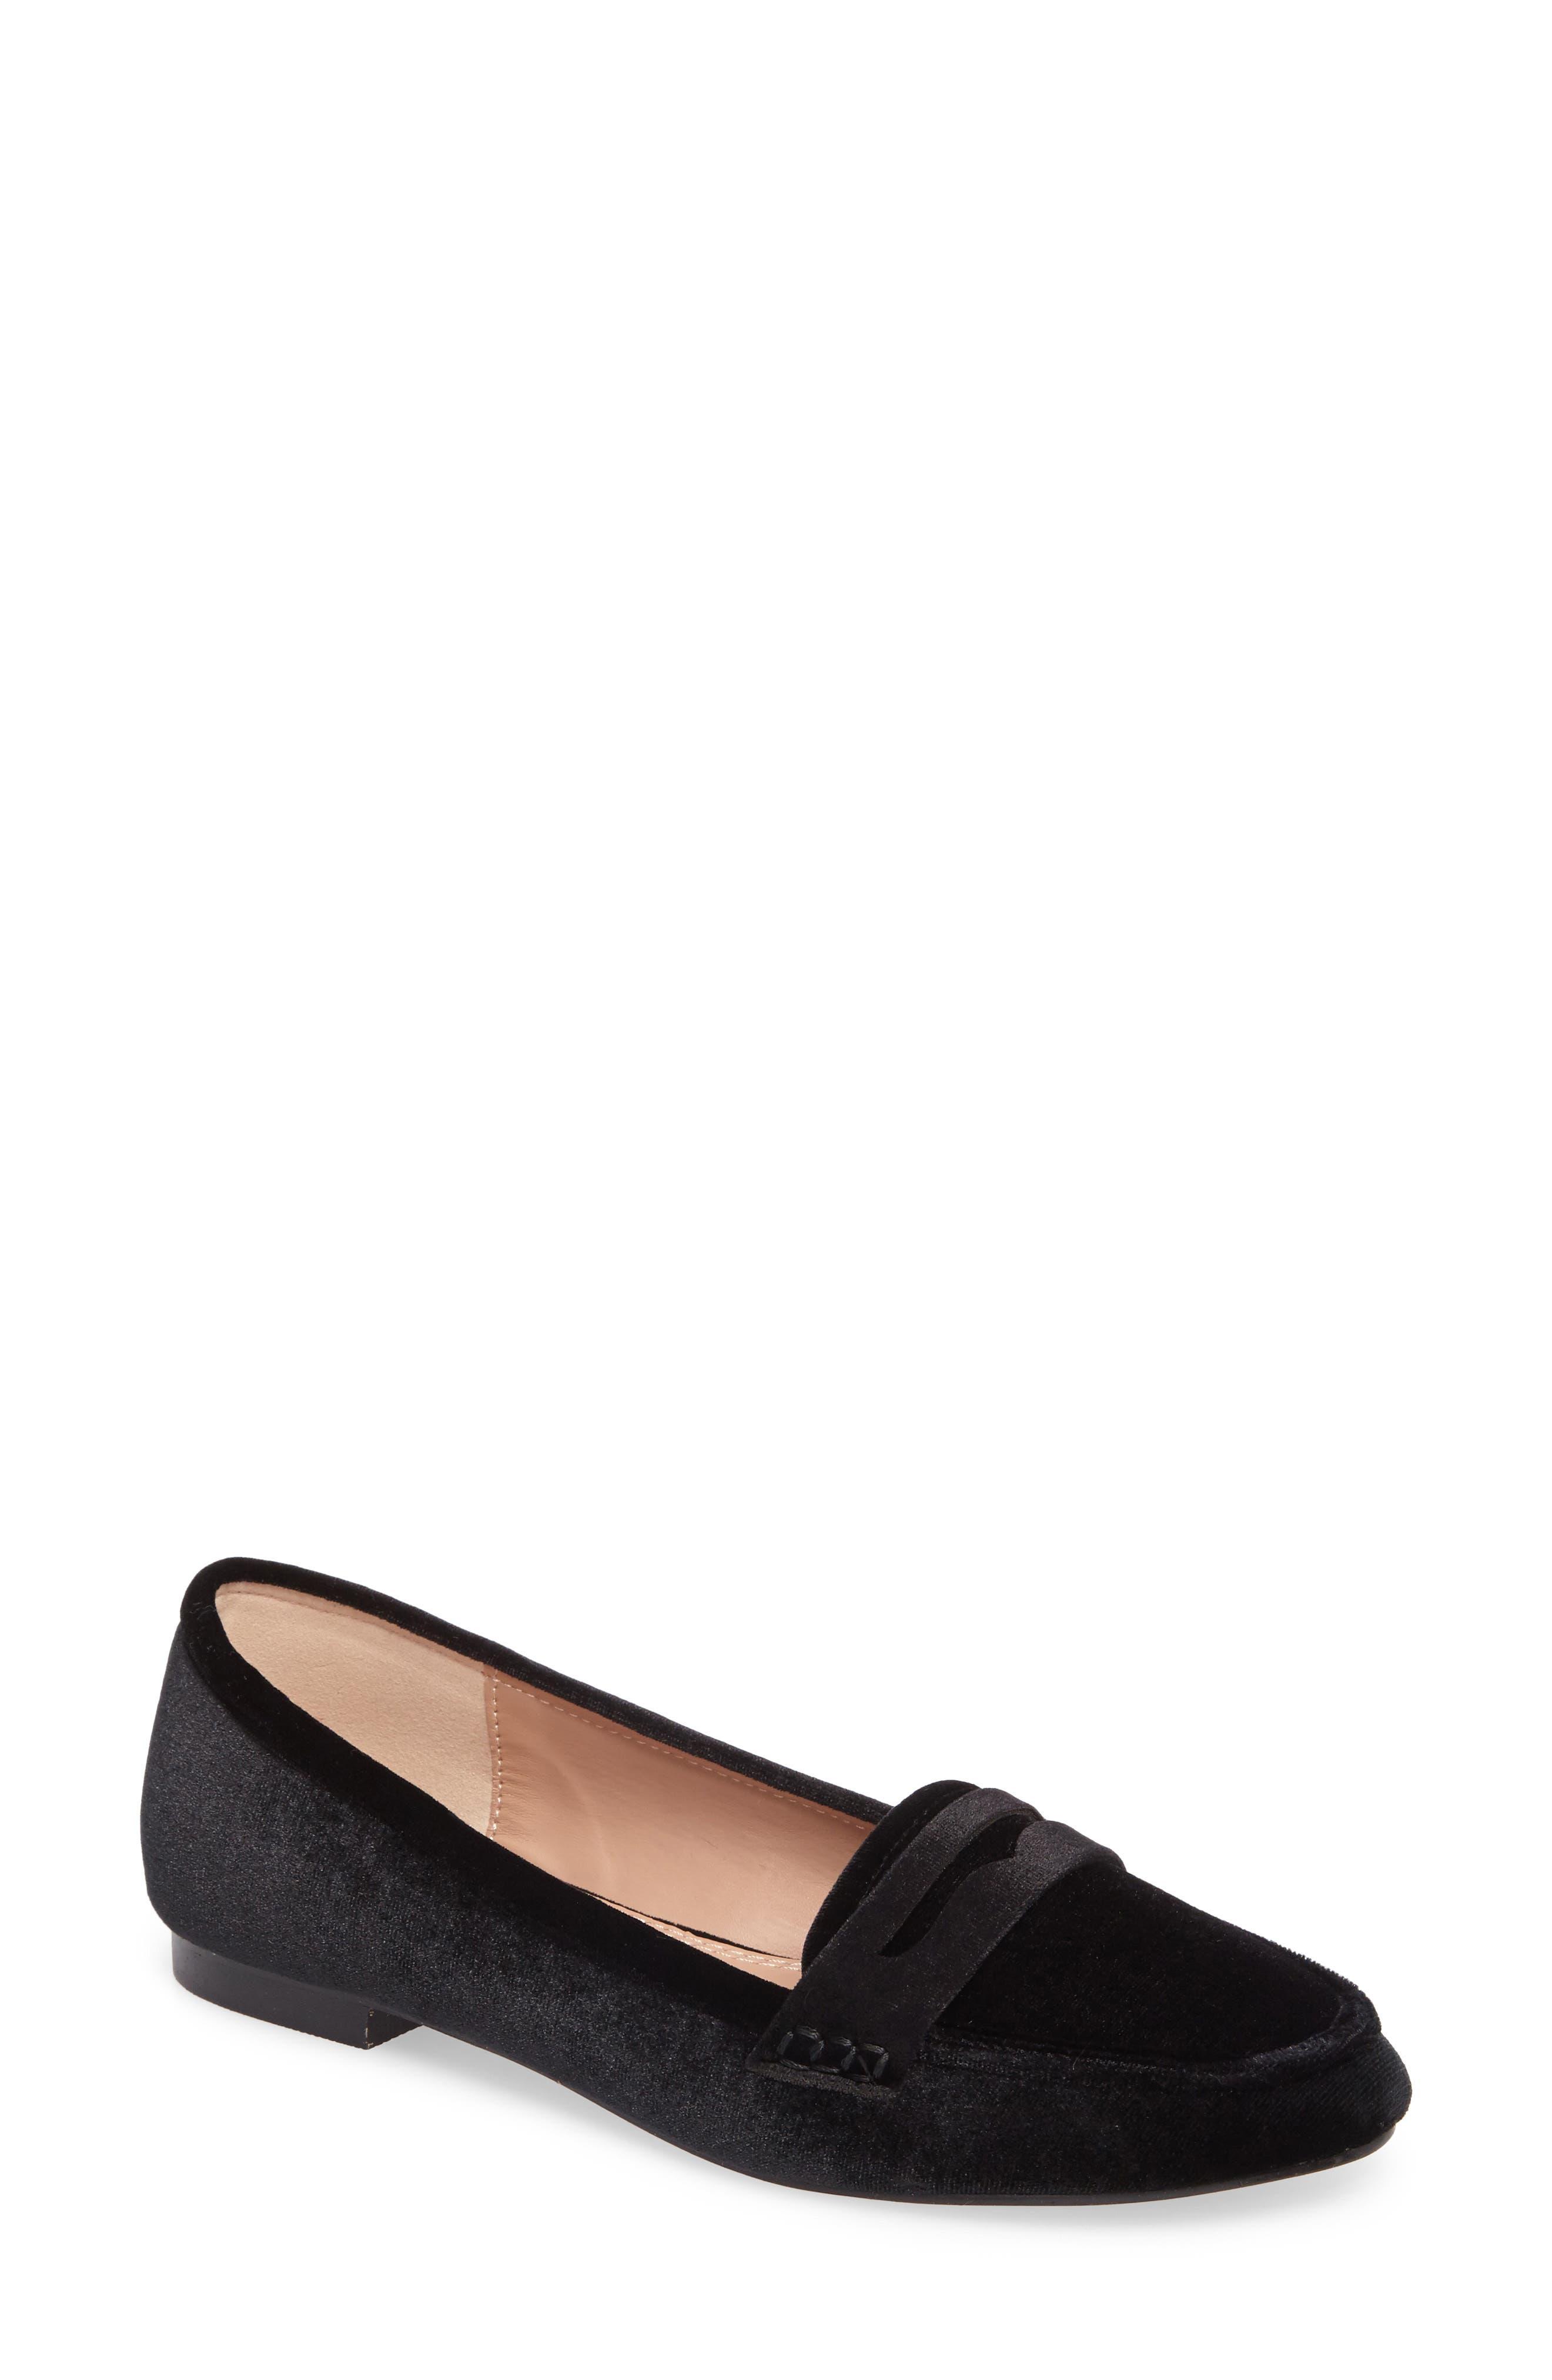 Callisto Loafer Flat (Women)